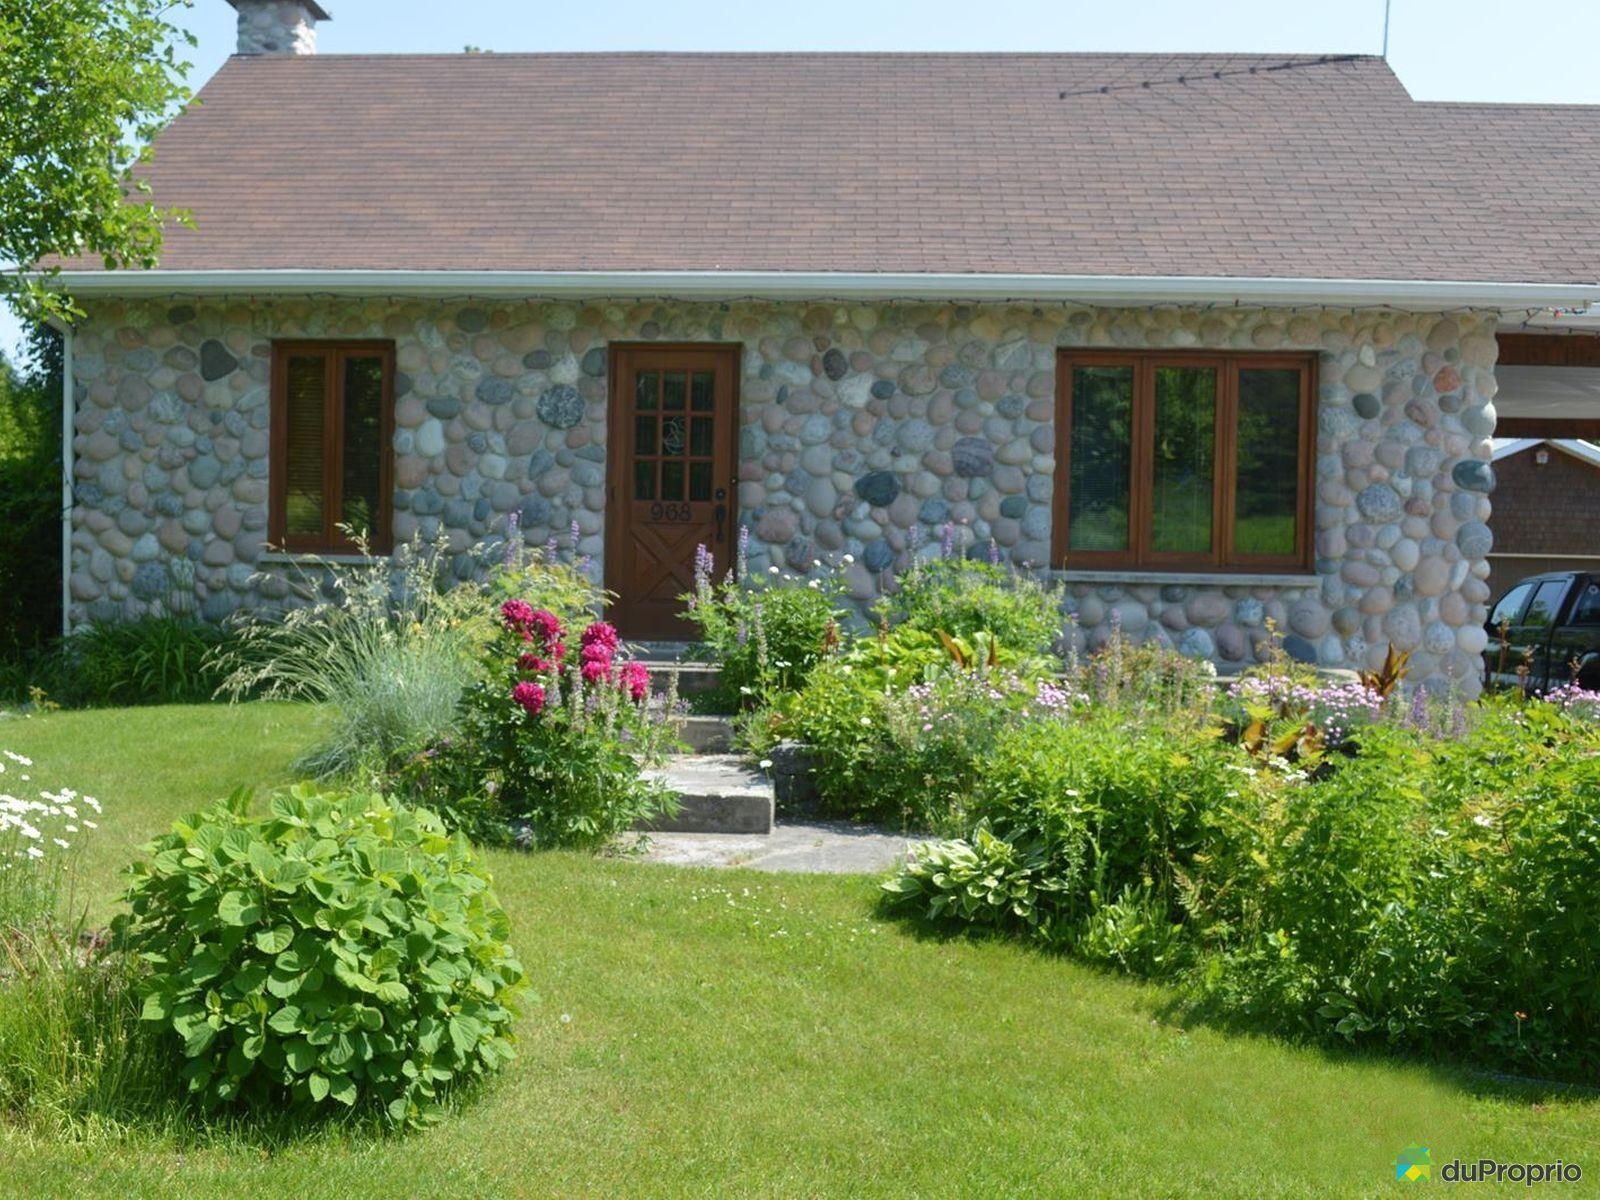 Maison vendre st prime 968 rang 6e immobilier qu bec duproprio 433504 for Maison 1970 renovation